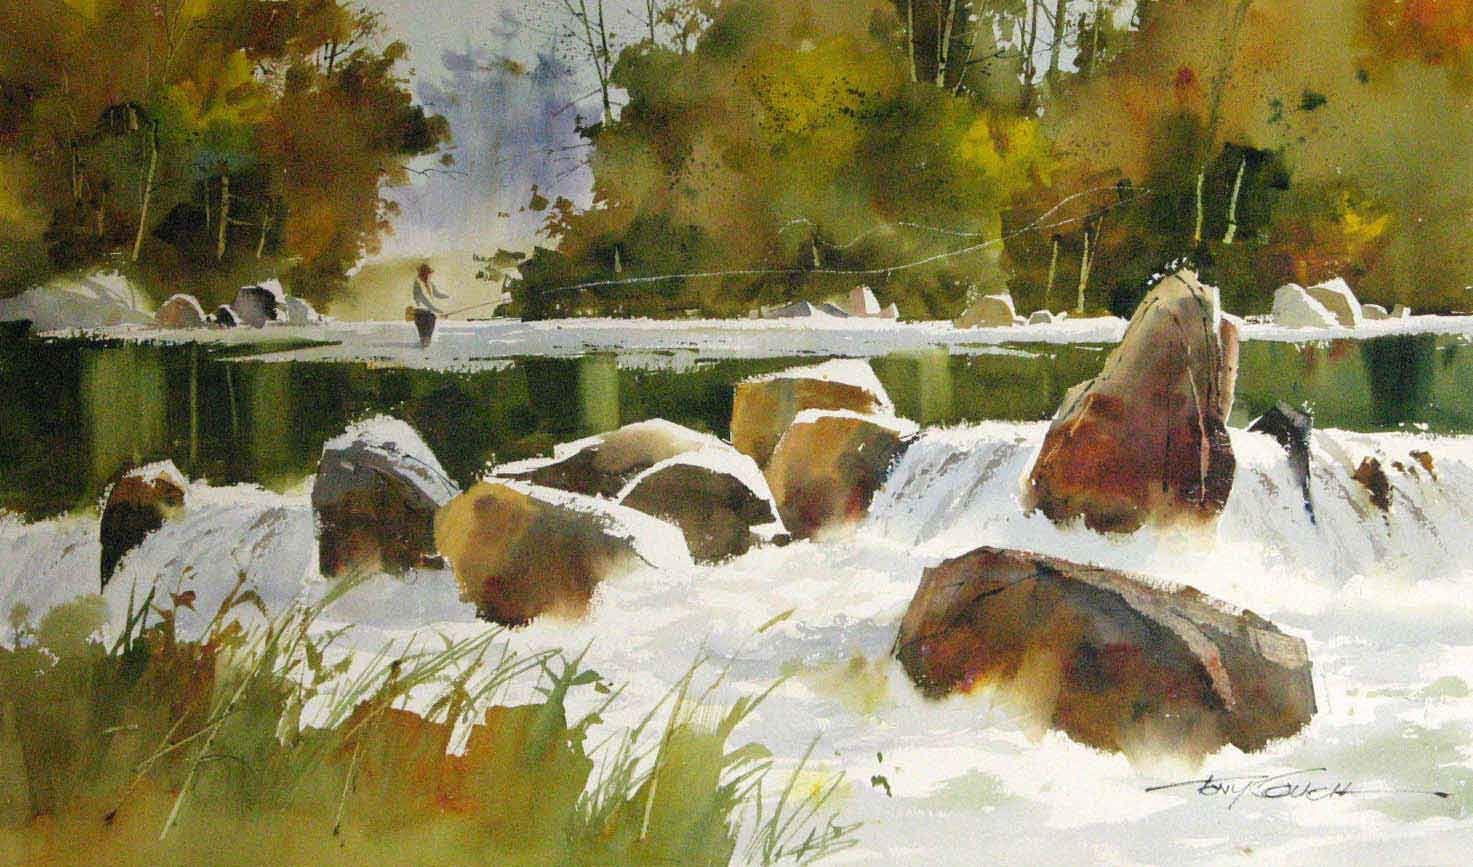 Tony Couch F02 Aquarelle Peinture Lac